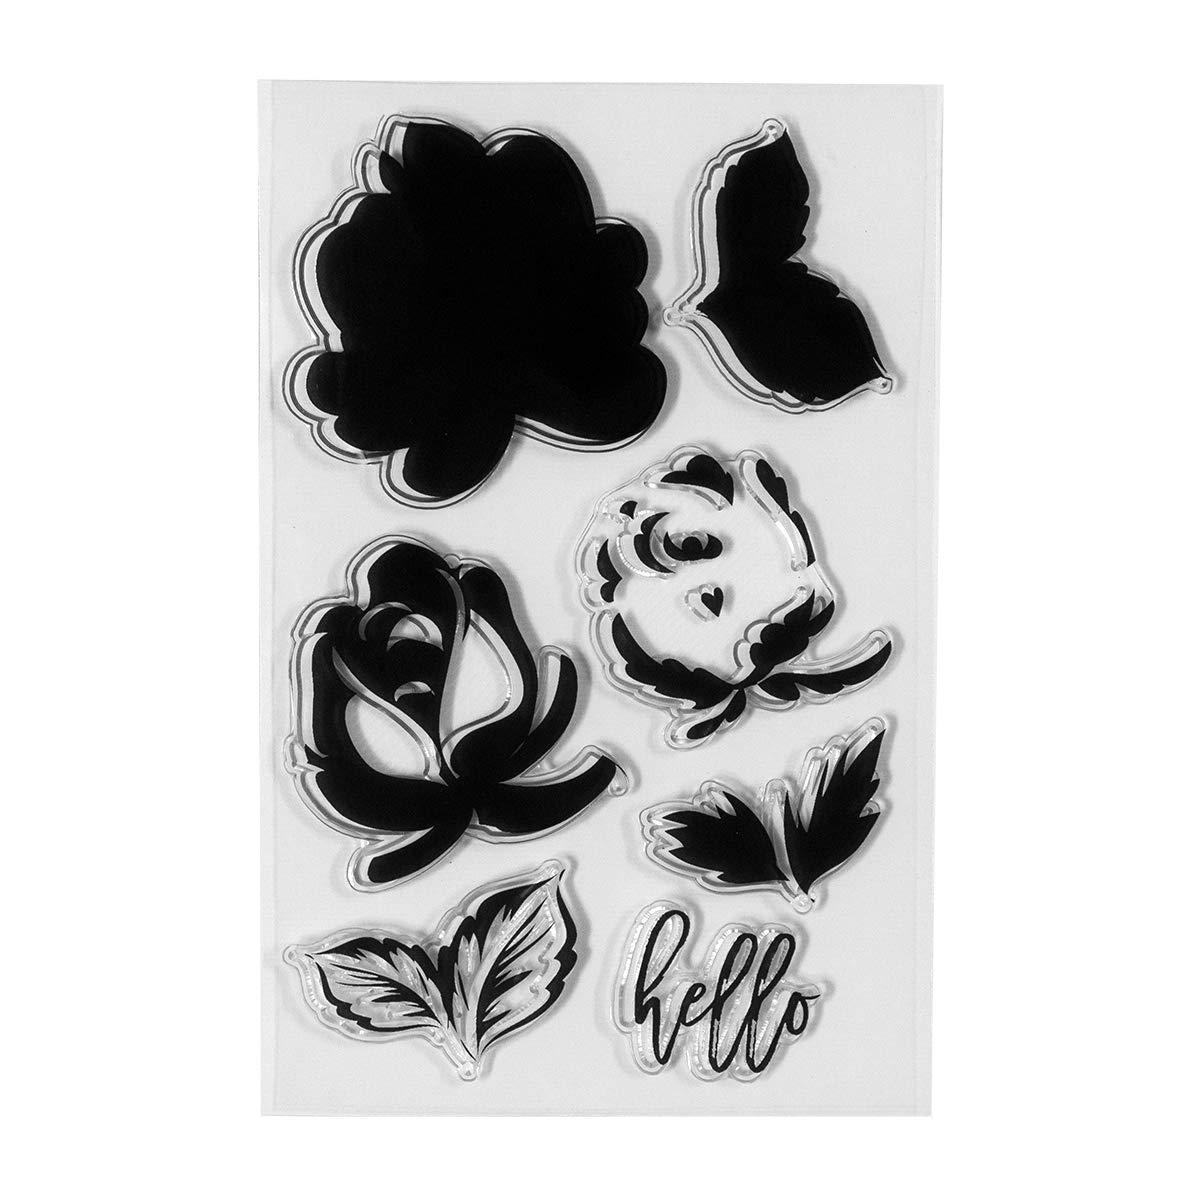 Spellbinders STP-001 Clear Stamp Set Layered Rose